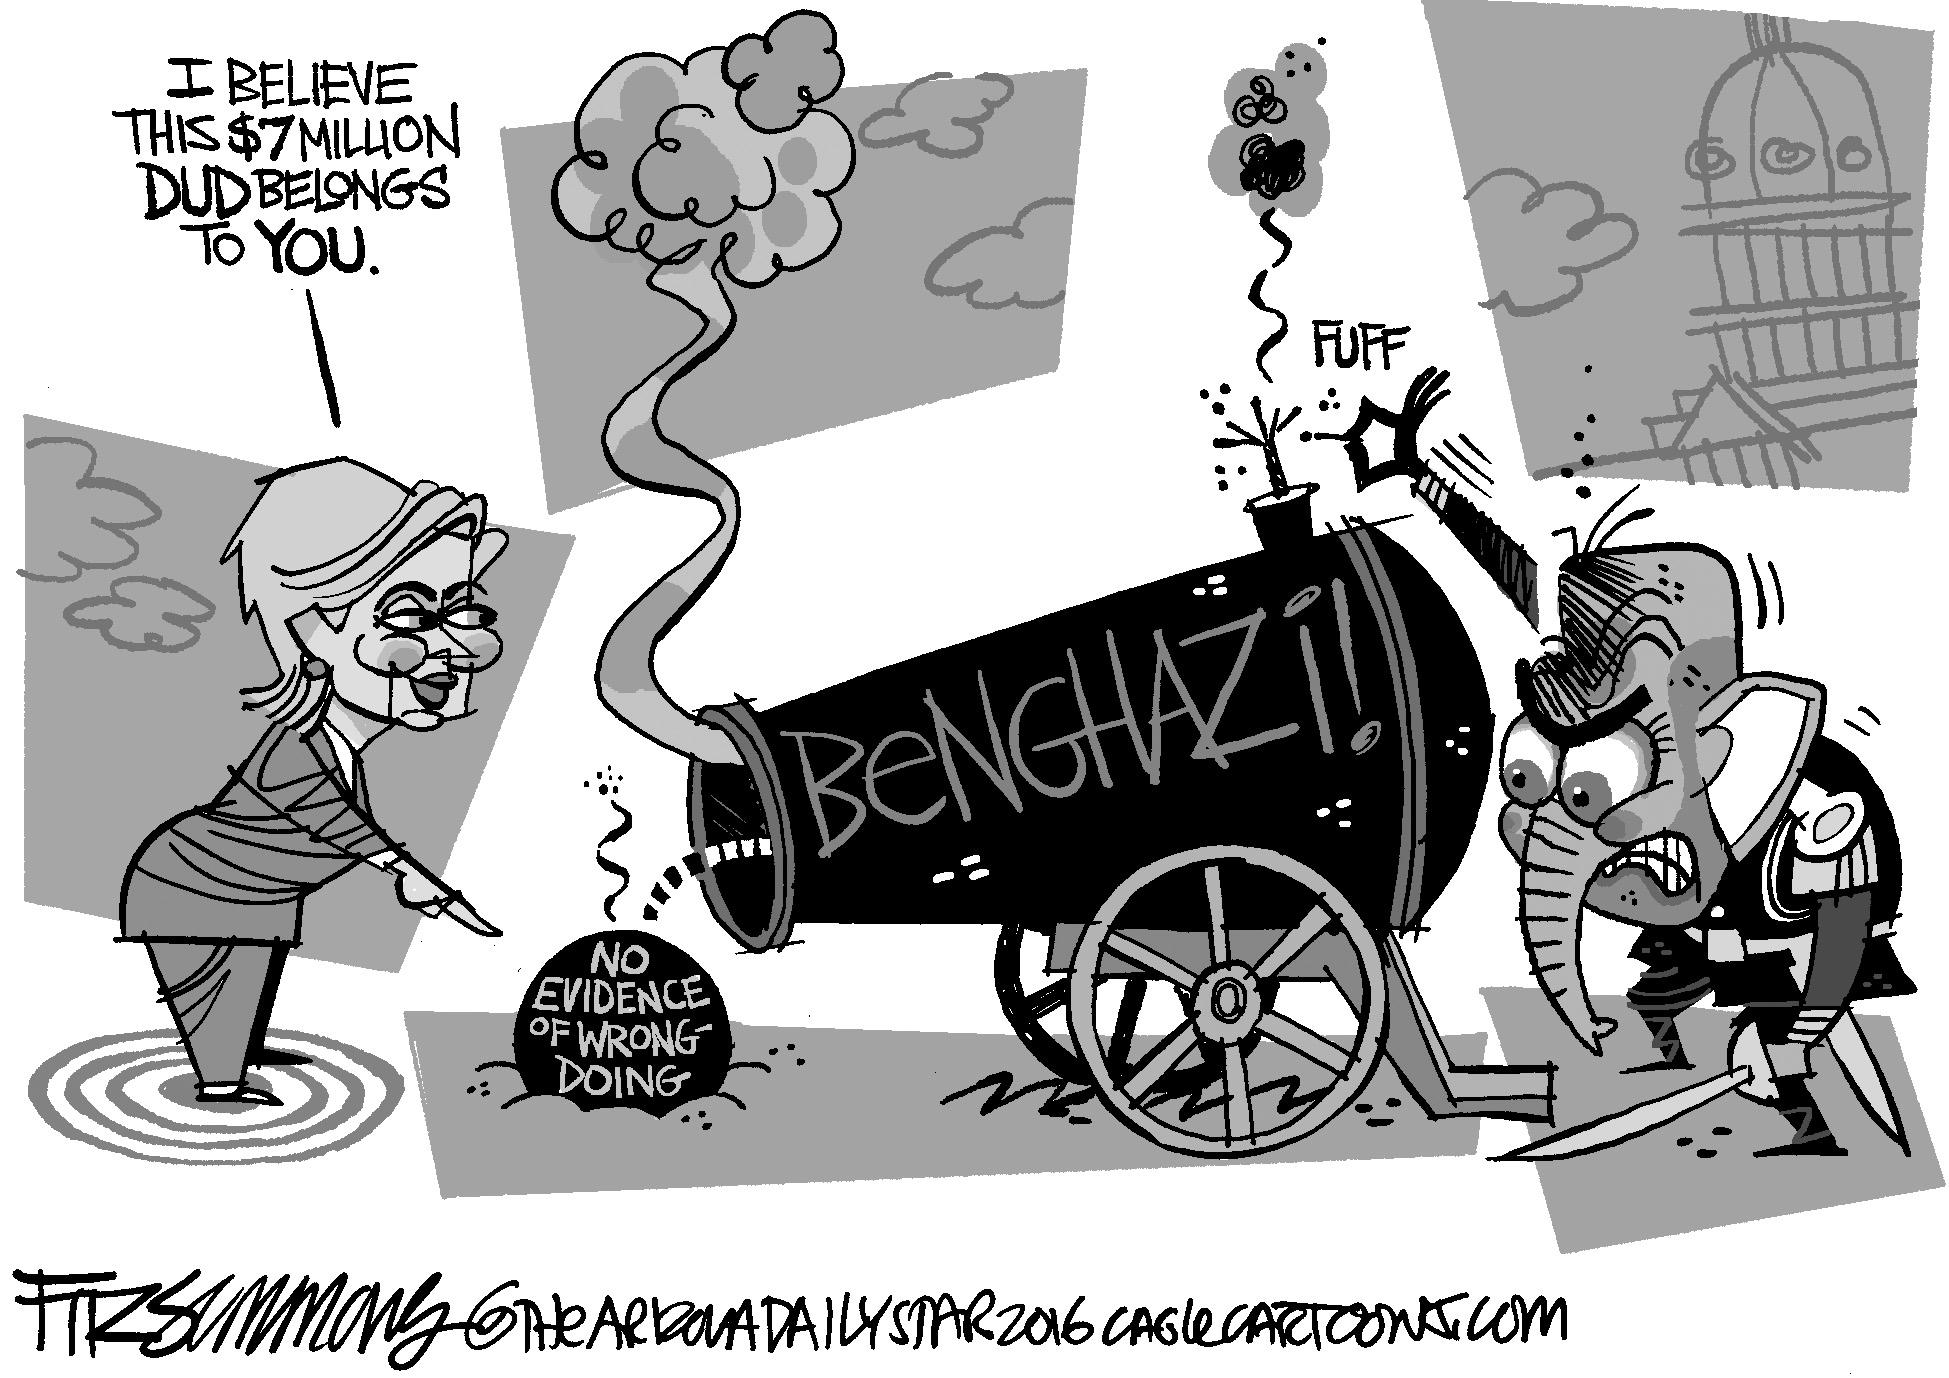 July 2: Benghazi Dud